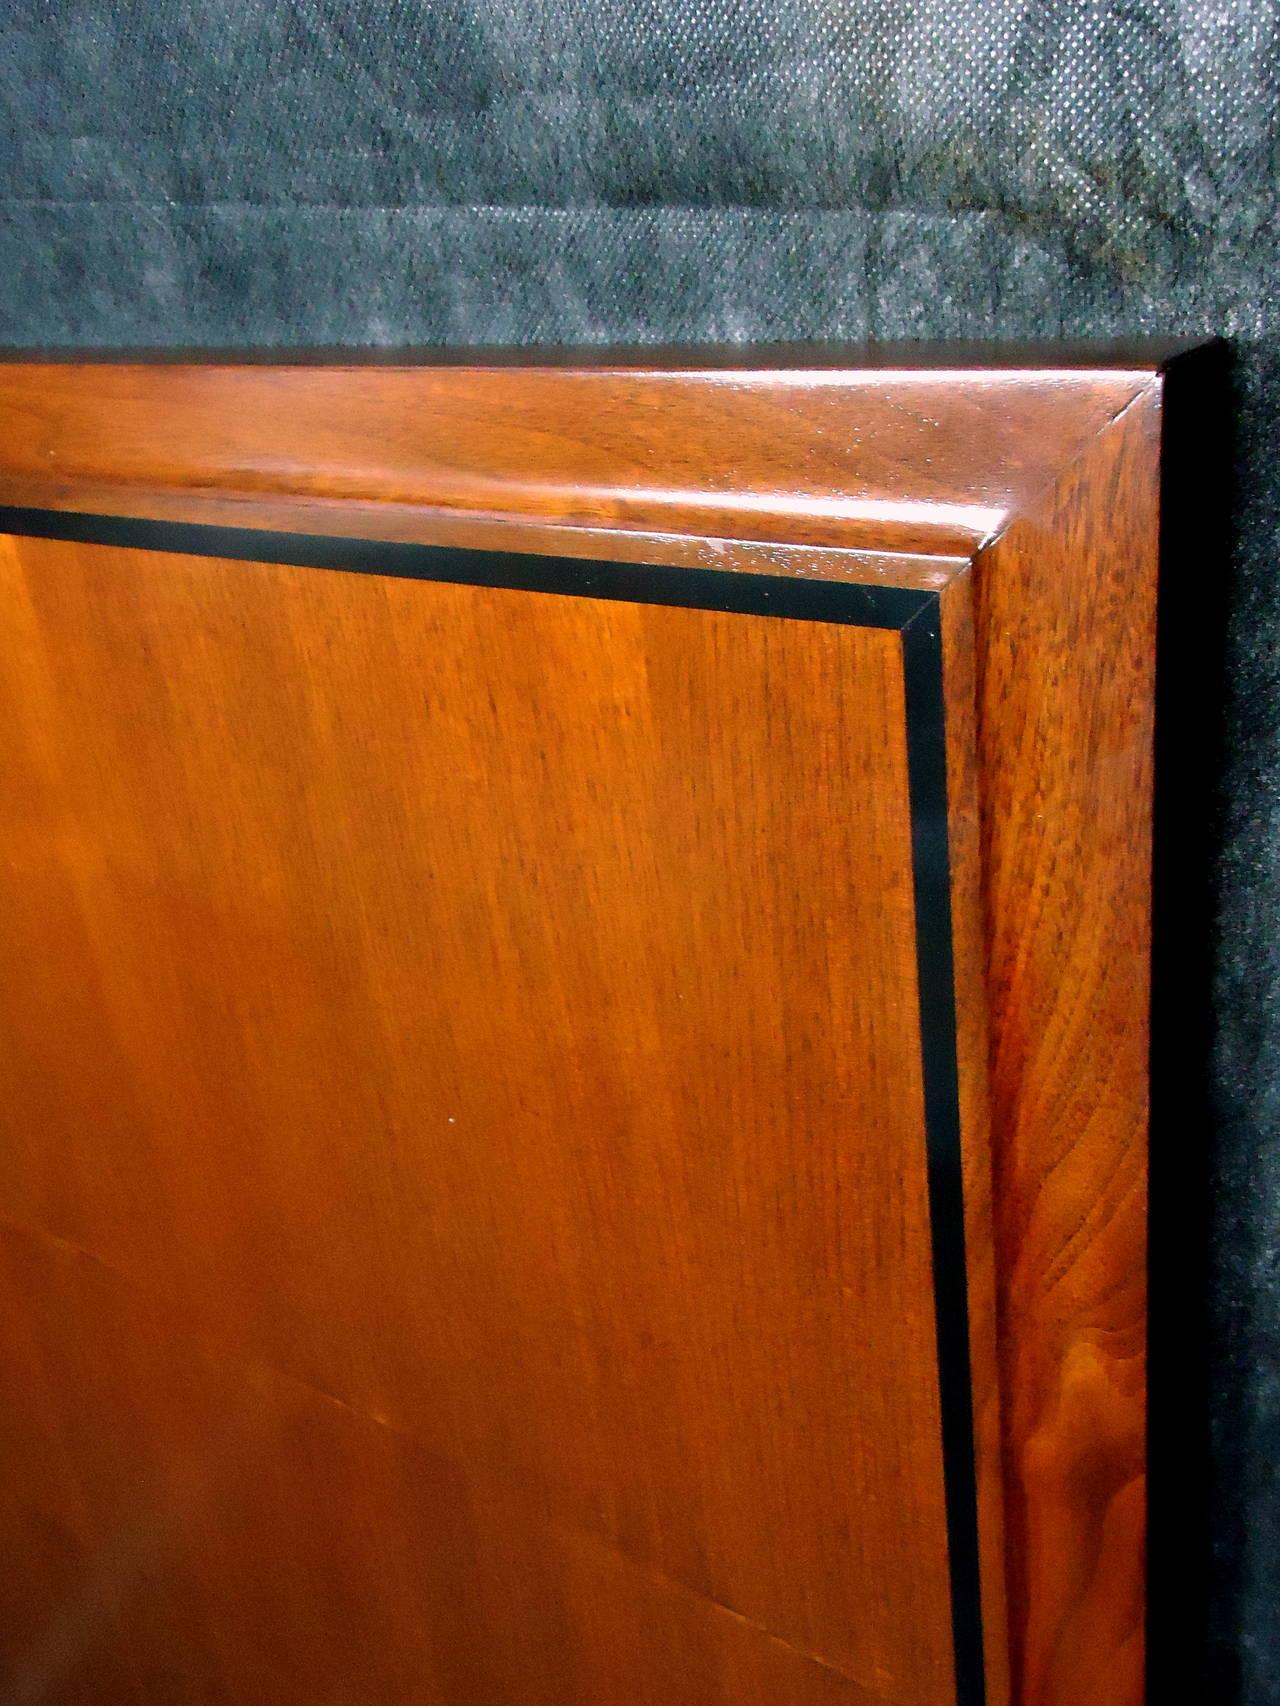 john kapel for glenn of california king size headboard circa 1960 for sale at 1stdibs. Black Bedroom Furniture Sets. Home Design Ideas